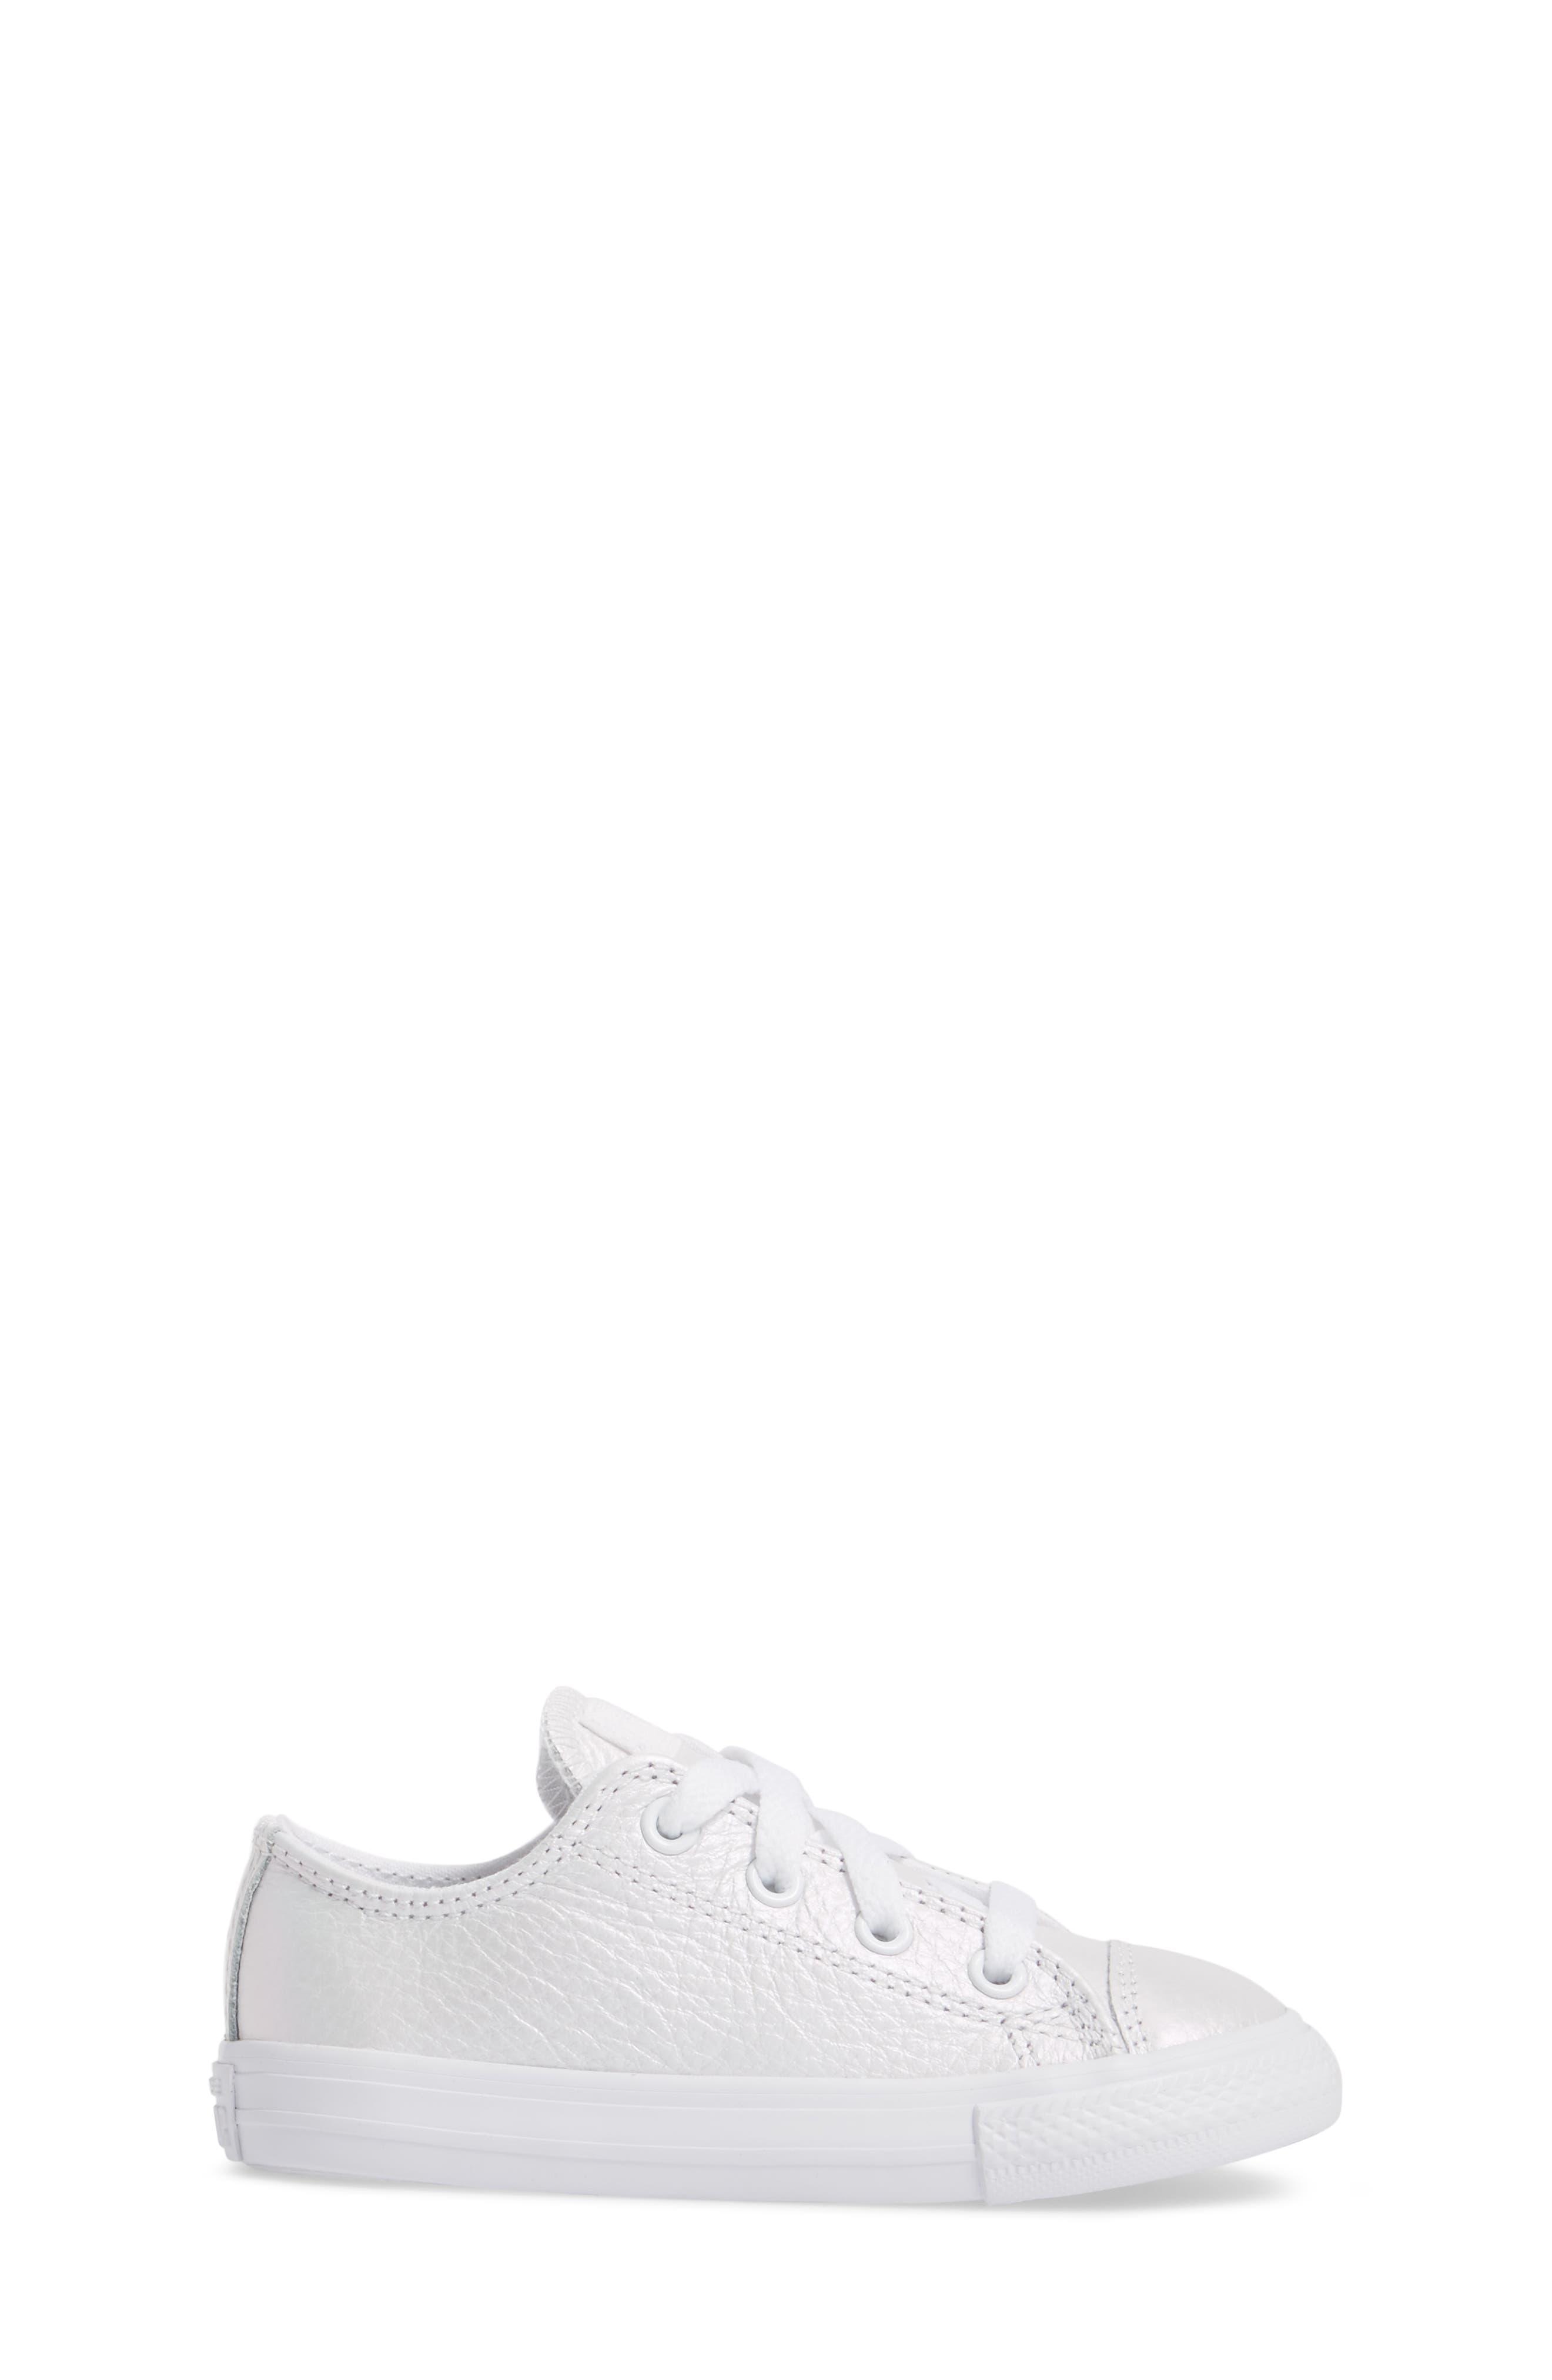 Alternate Image 3  - Converse Chuck Taylor® All Star® Iridescent Sneaker (Baby, Walker, Toddler & Little Kid)